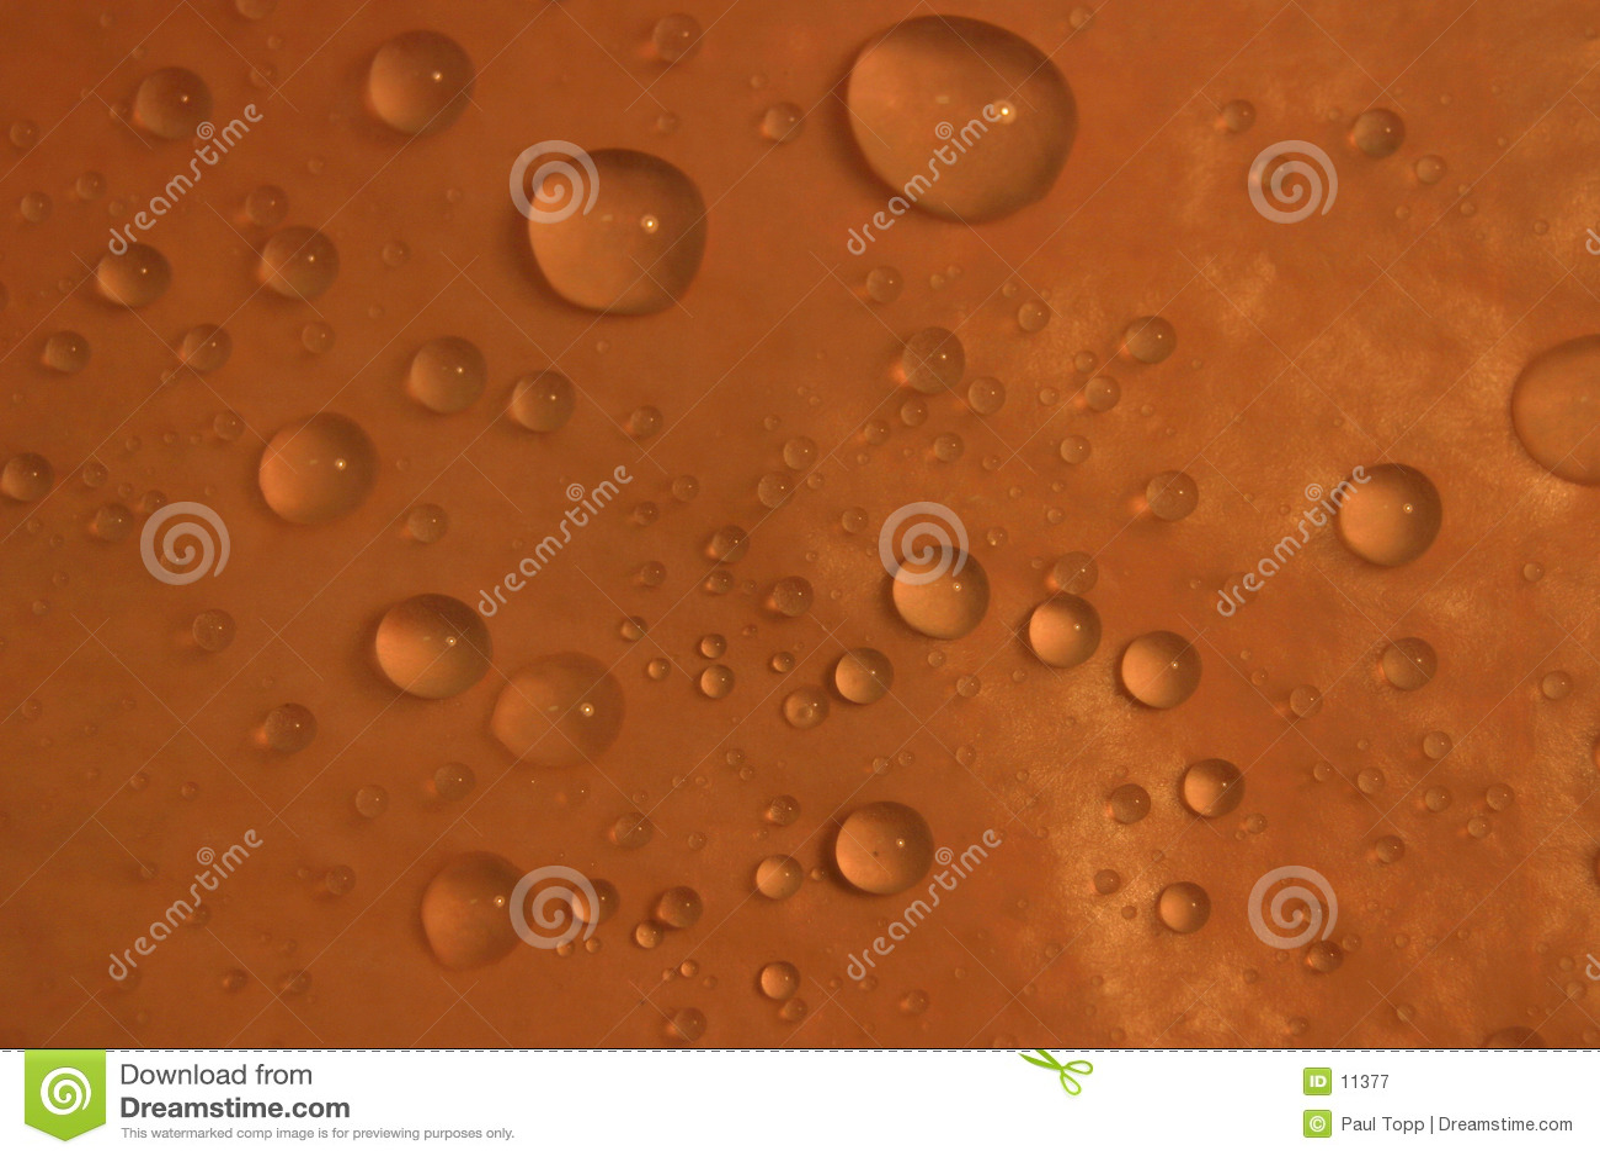 предпосылка падает померанцовая вода